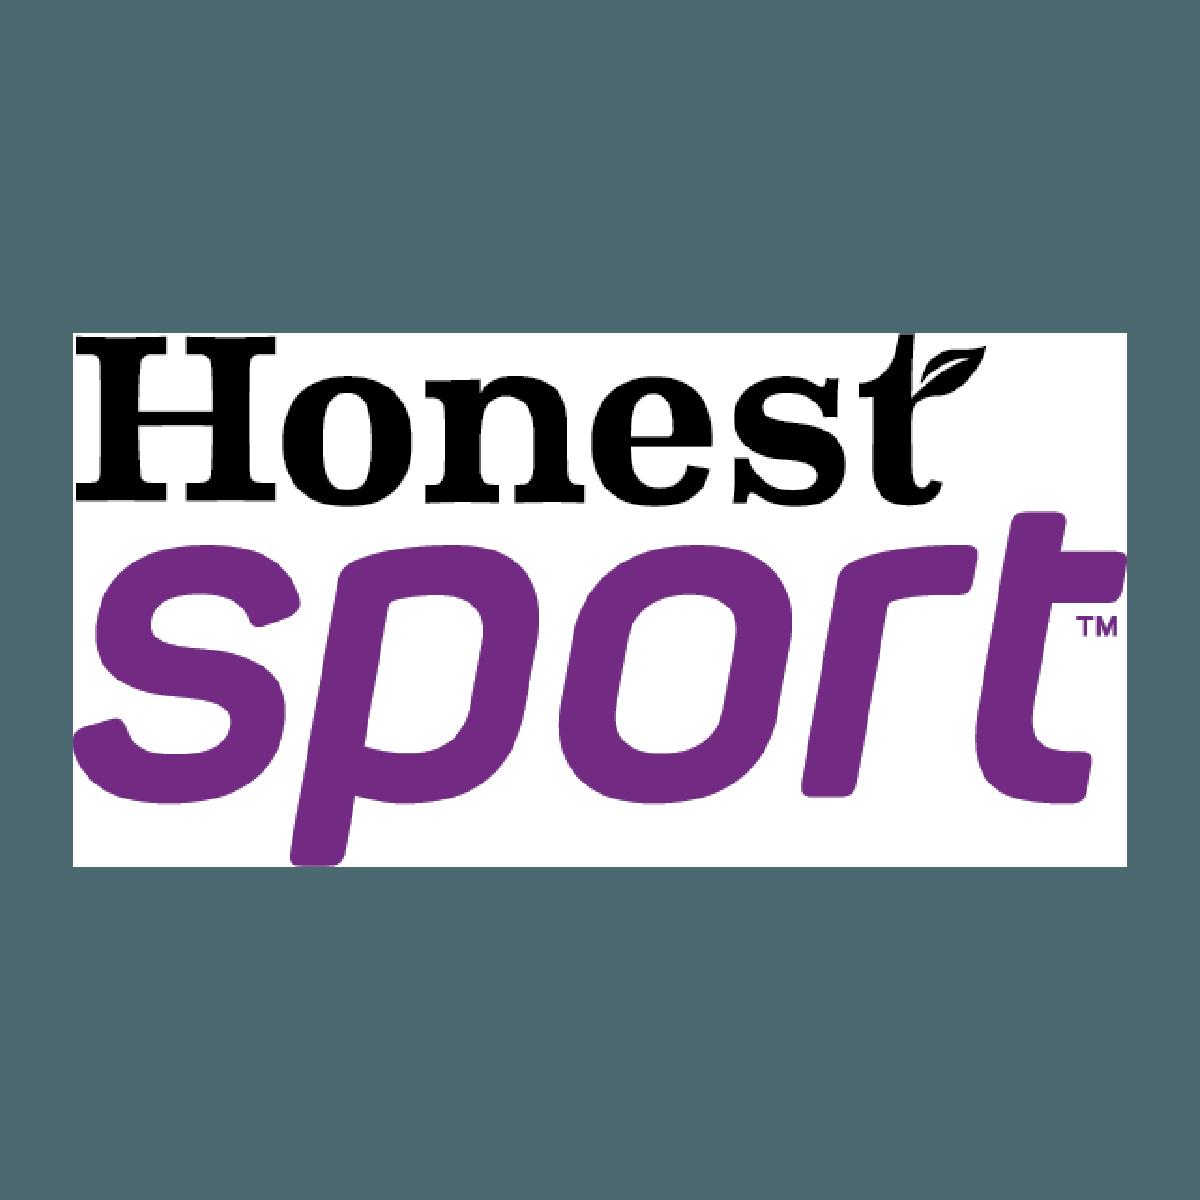 HONEST_SPORT_BERRY[4712].jpg